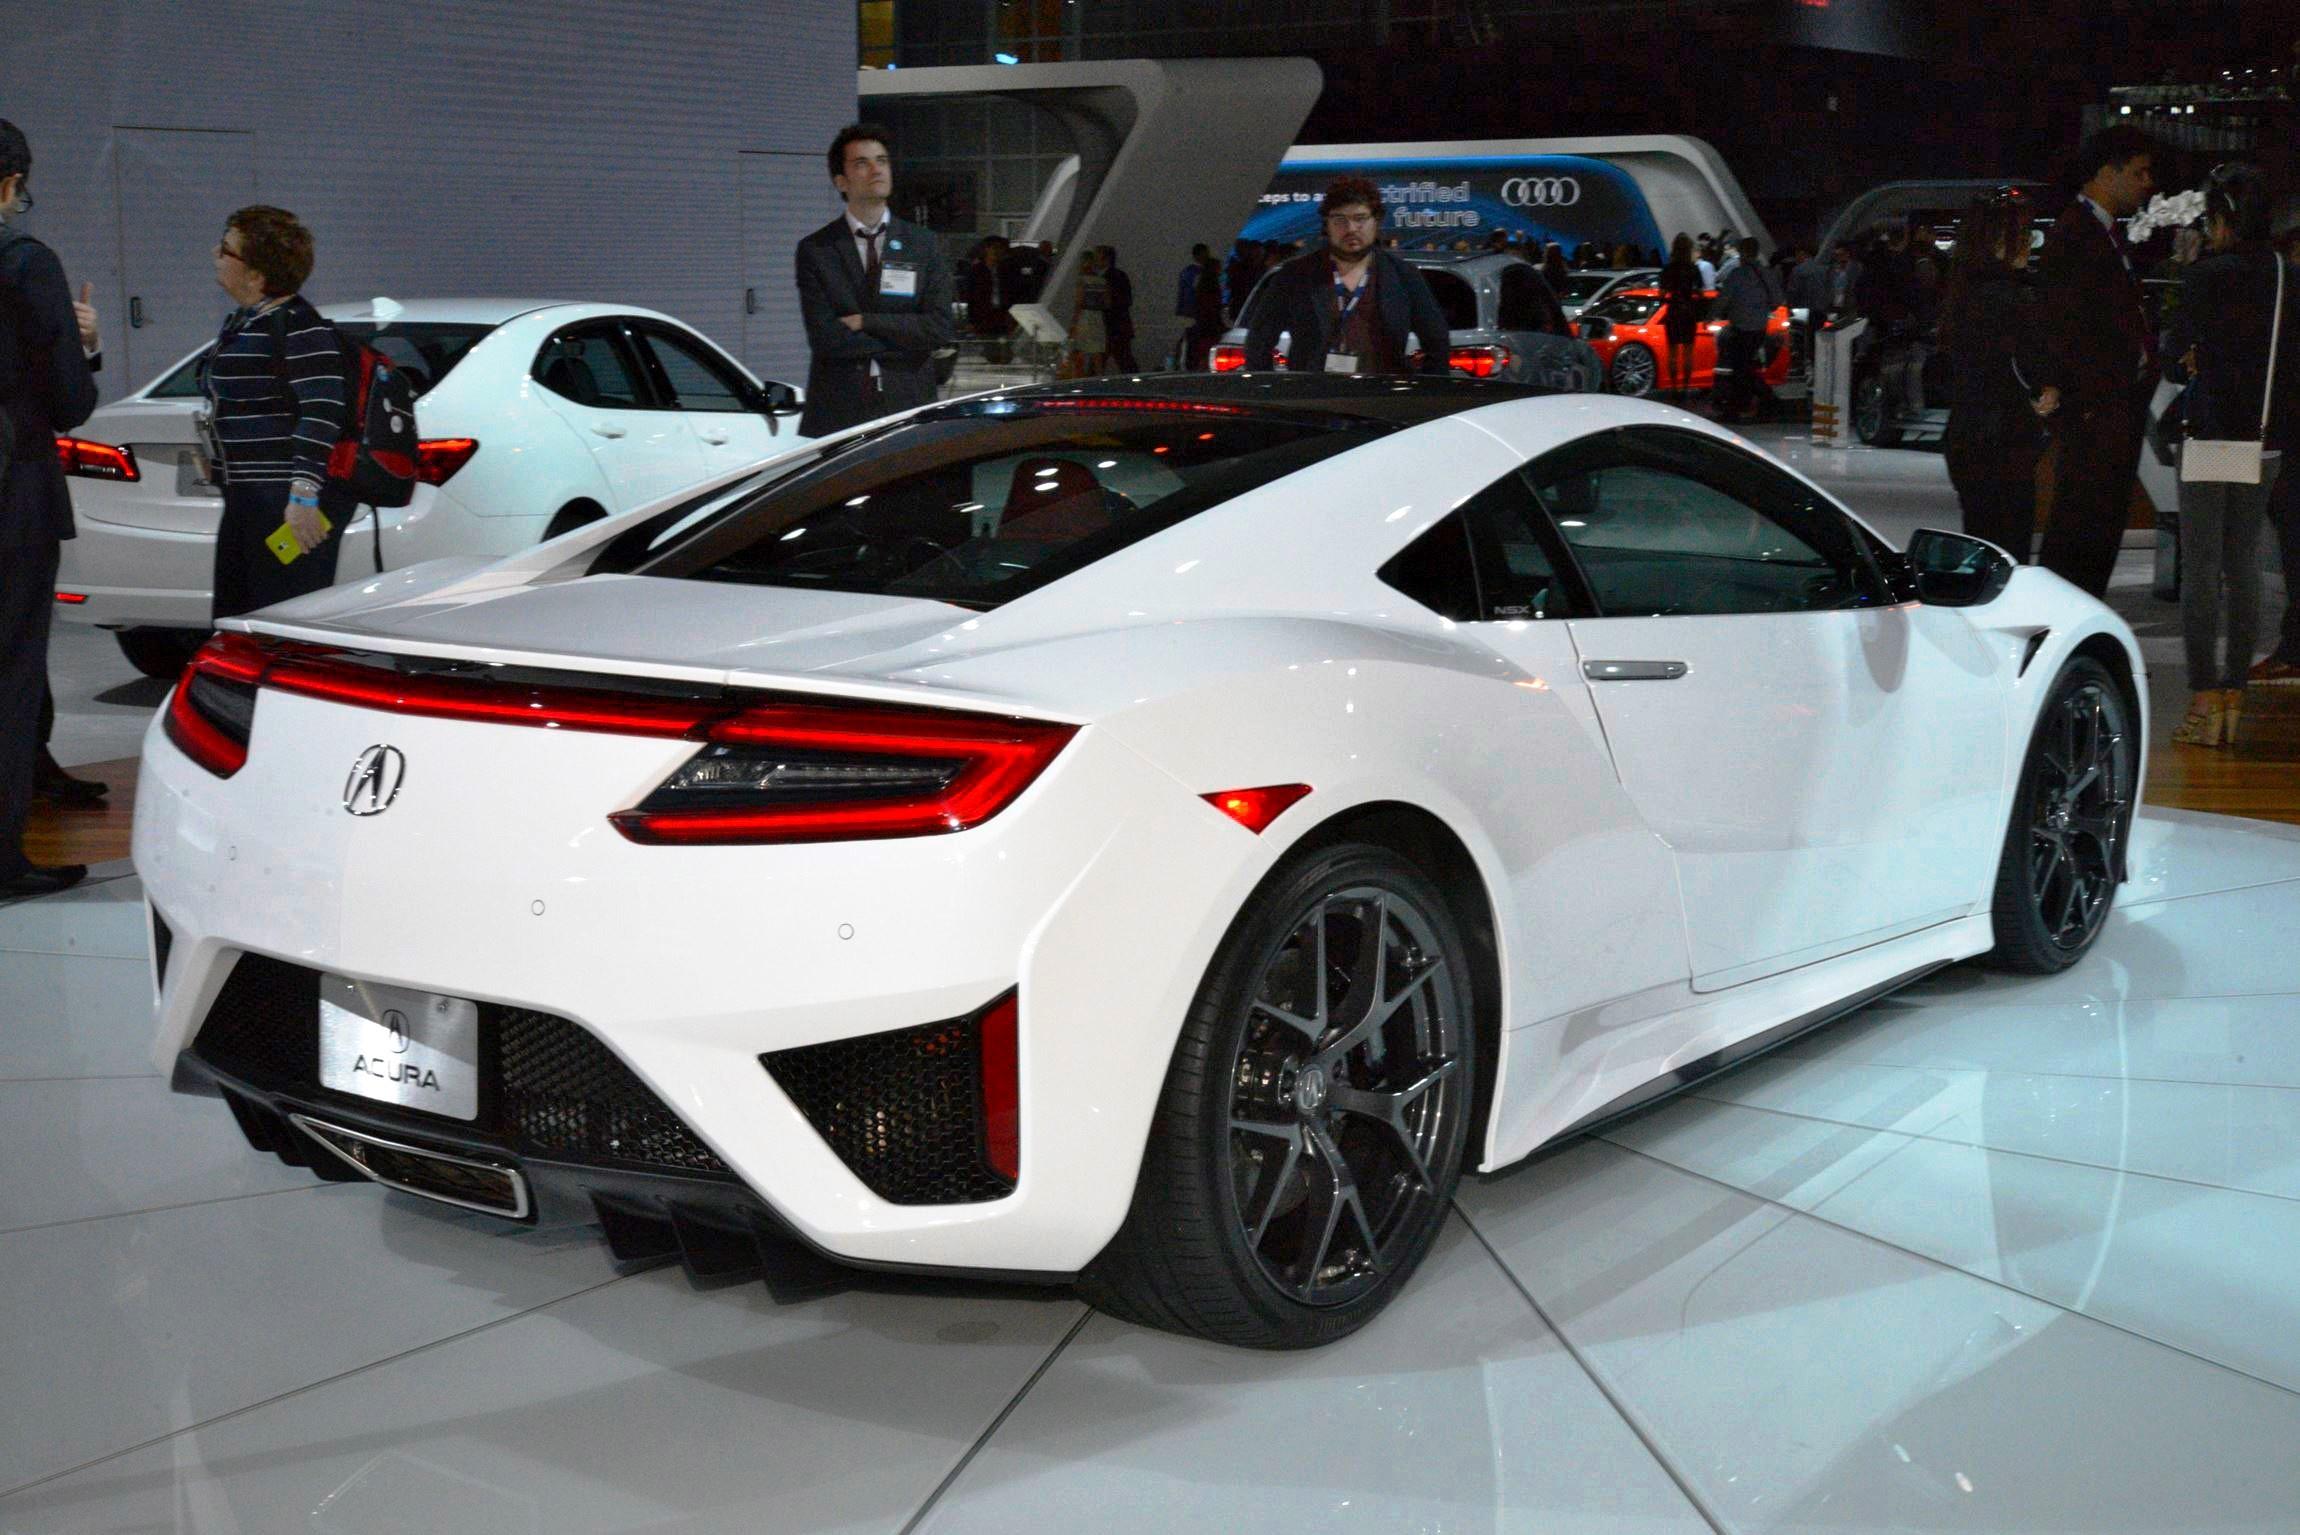 2017 Acura NSX white 4